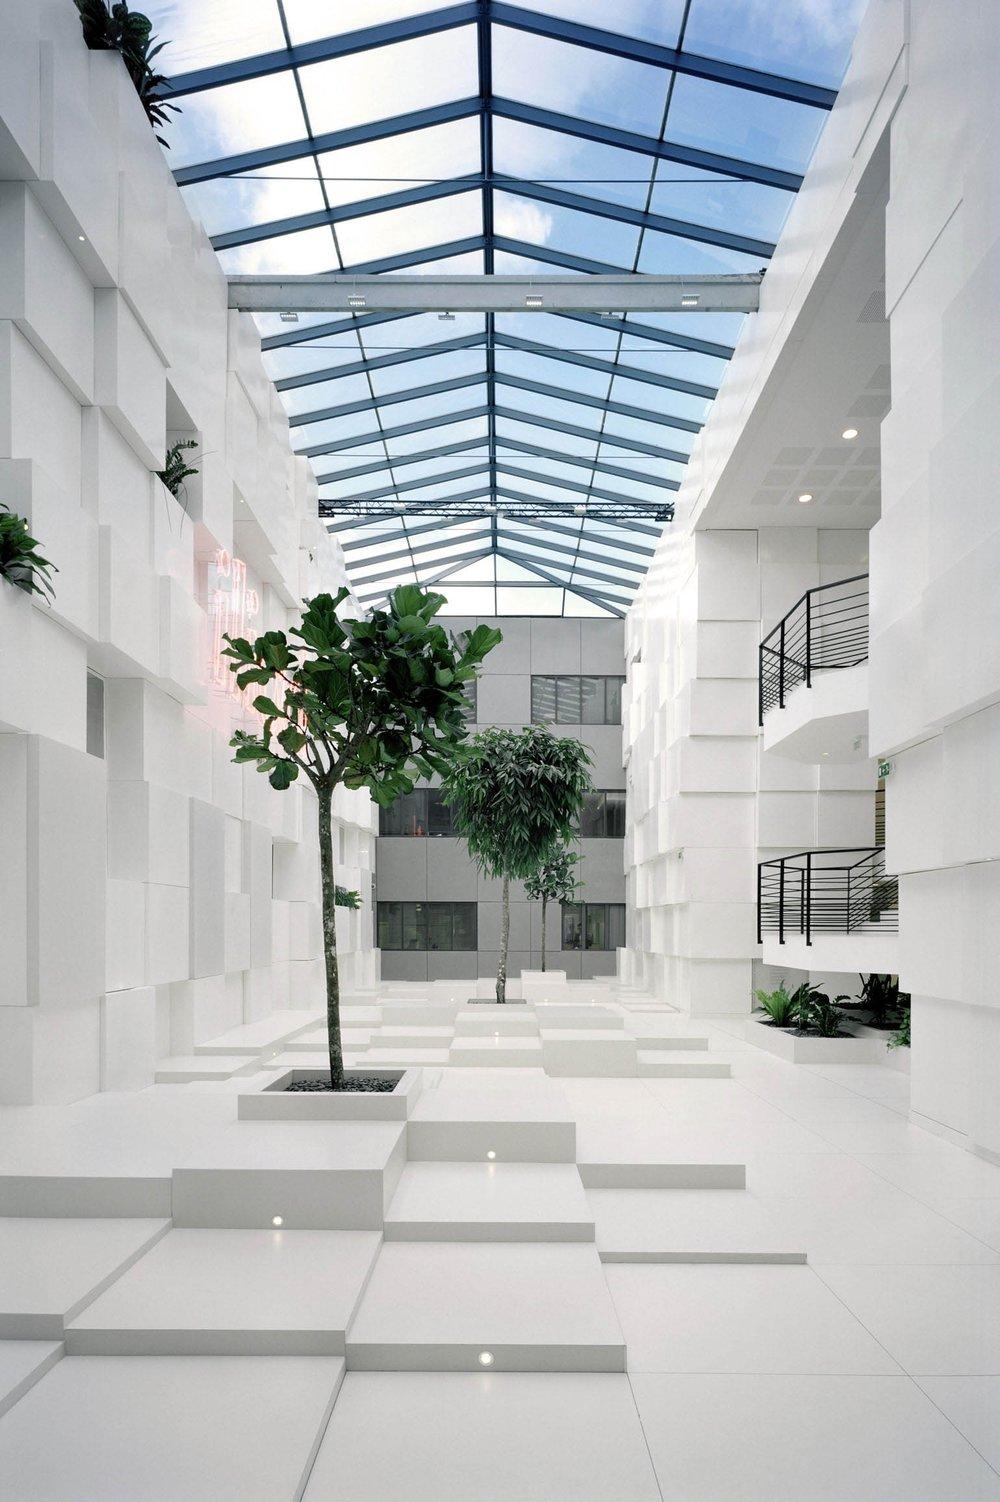 DC3 data center illiad xavier niel ar studio d'architectures (1).jpg